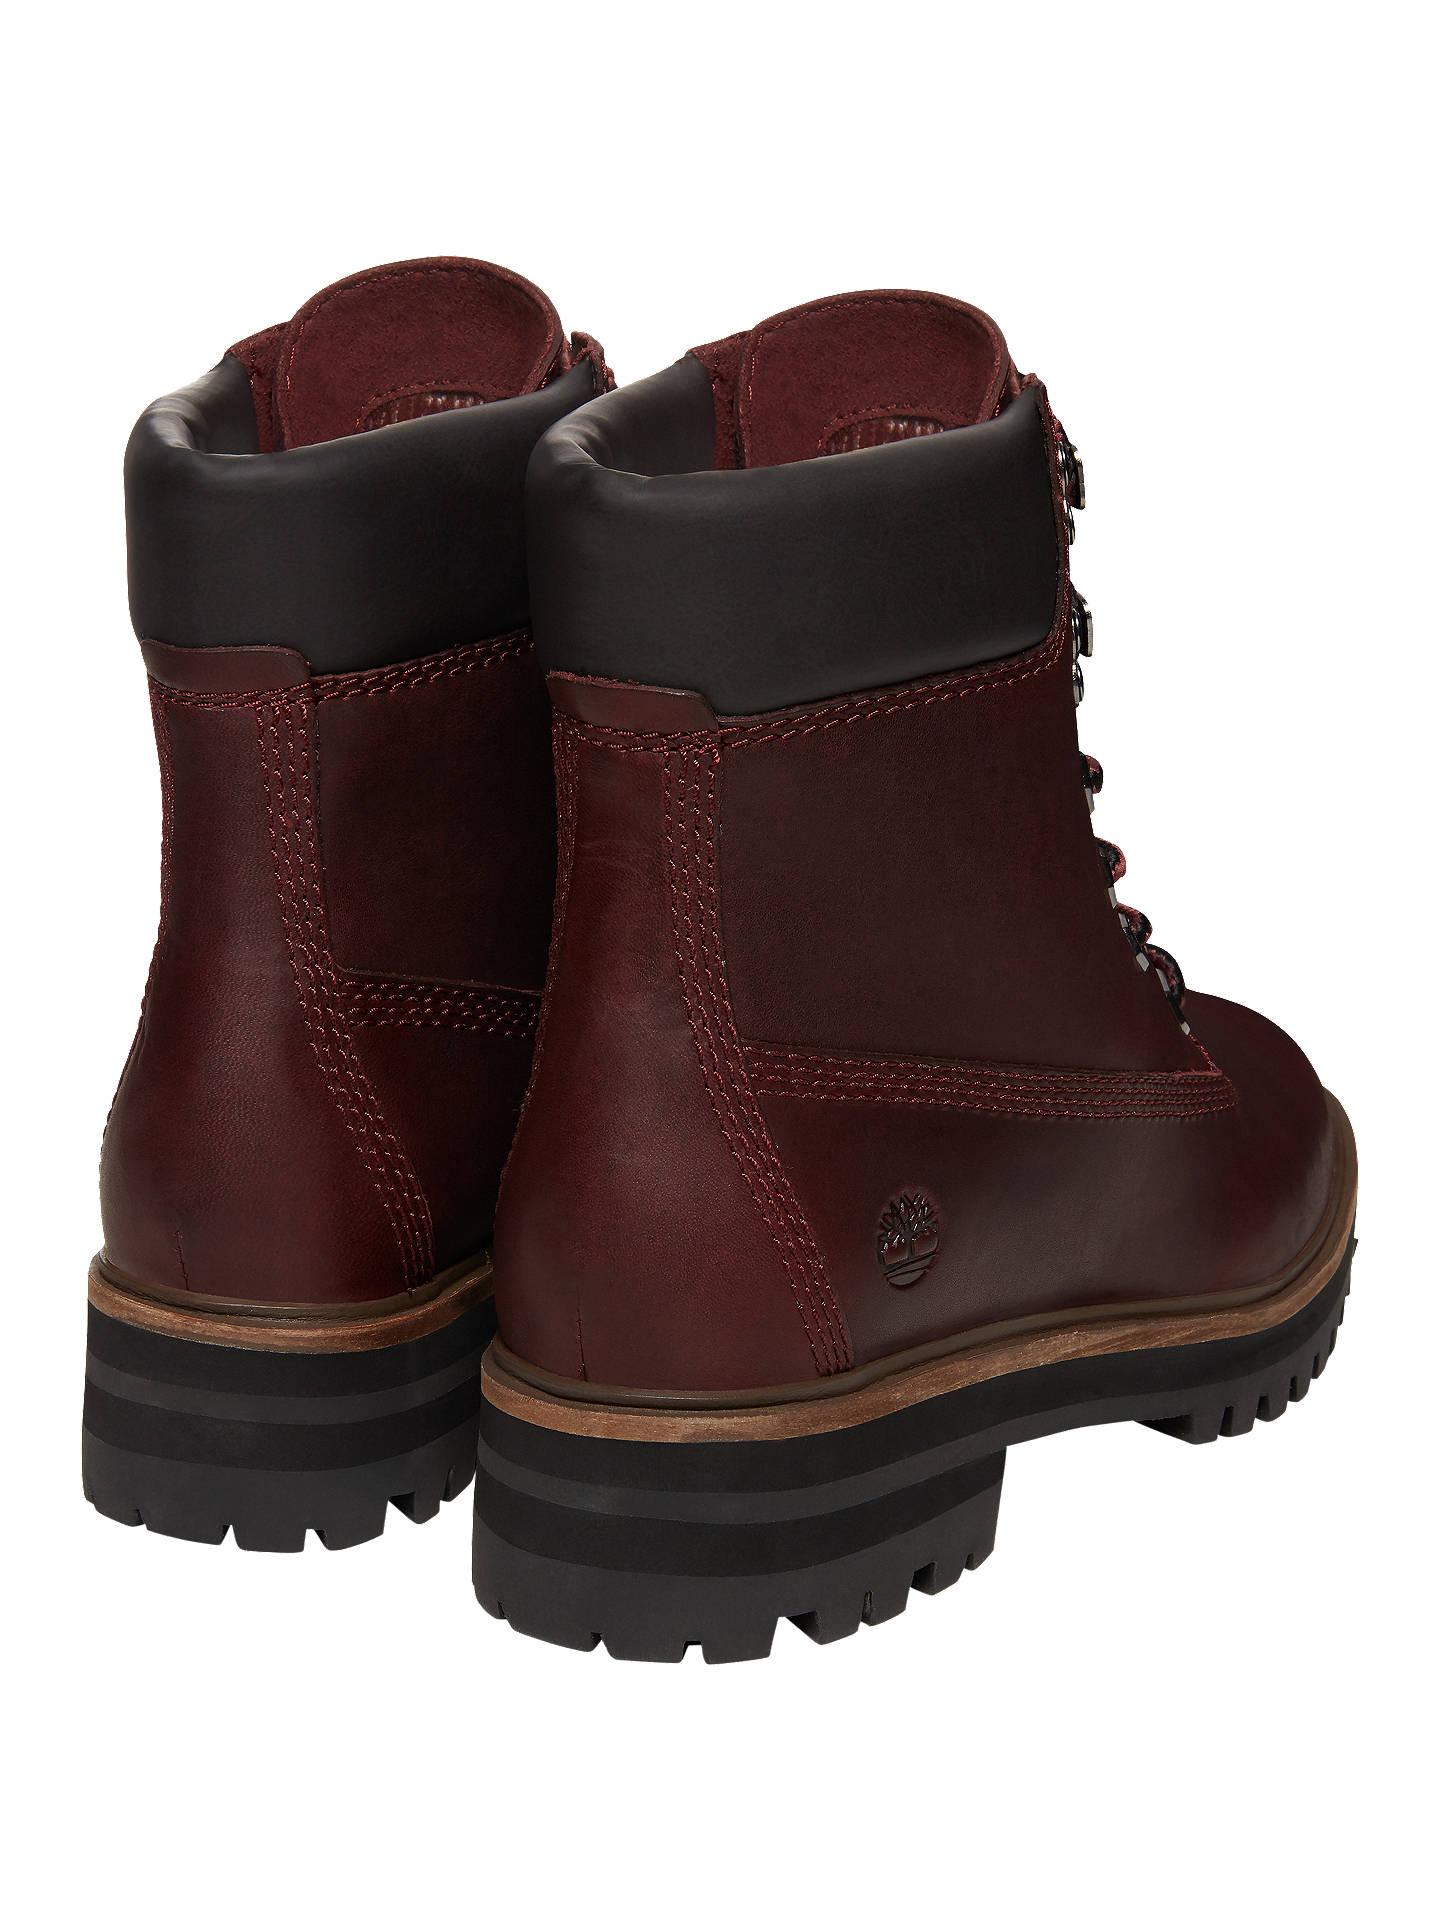 apilar reporte Majestuoso  Timberland London Square 6 Inch Boots | Burgundy at John Lewis & Partners